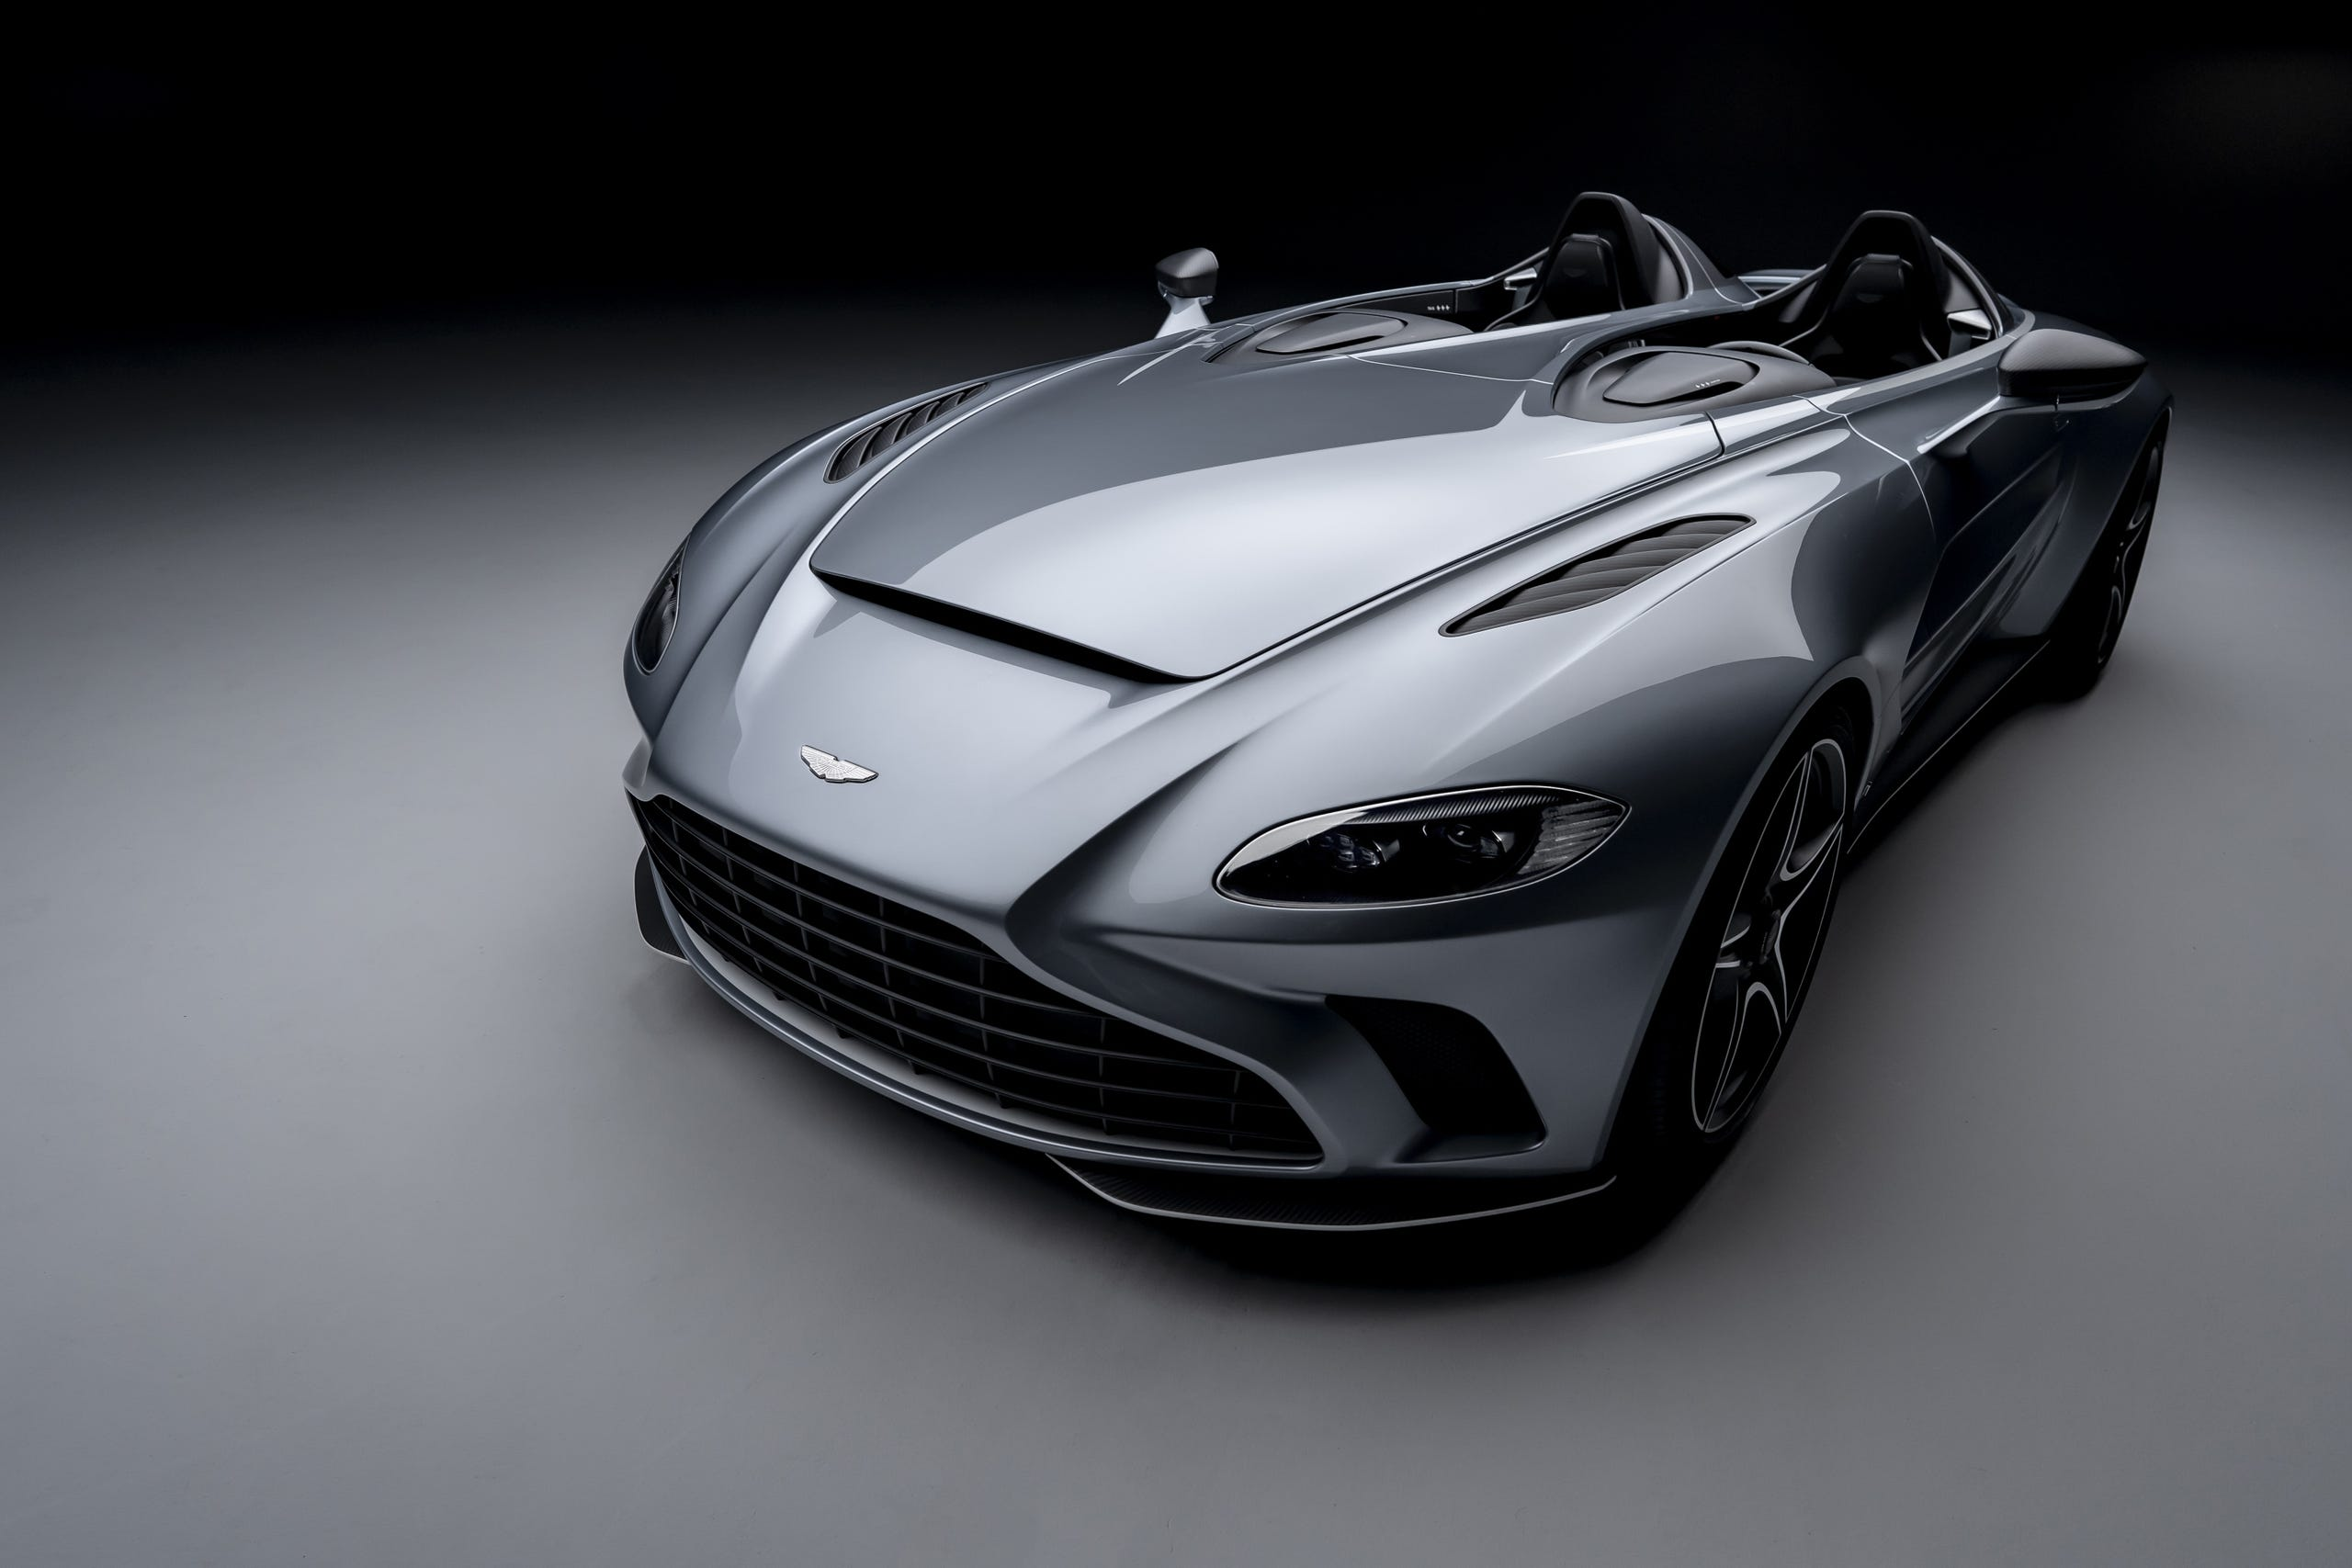 Aston Martin V12 Speedster A Fighter Jet Supercar Without Windshields